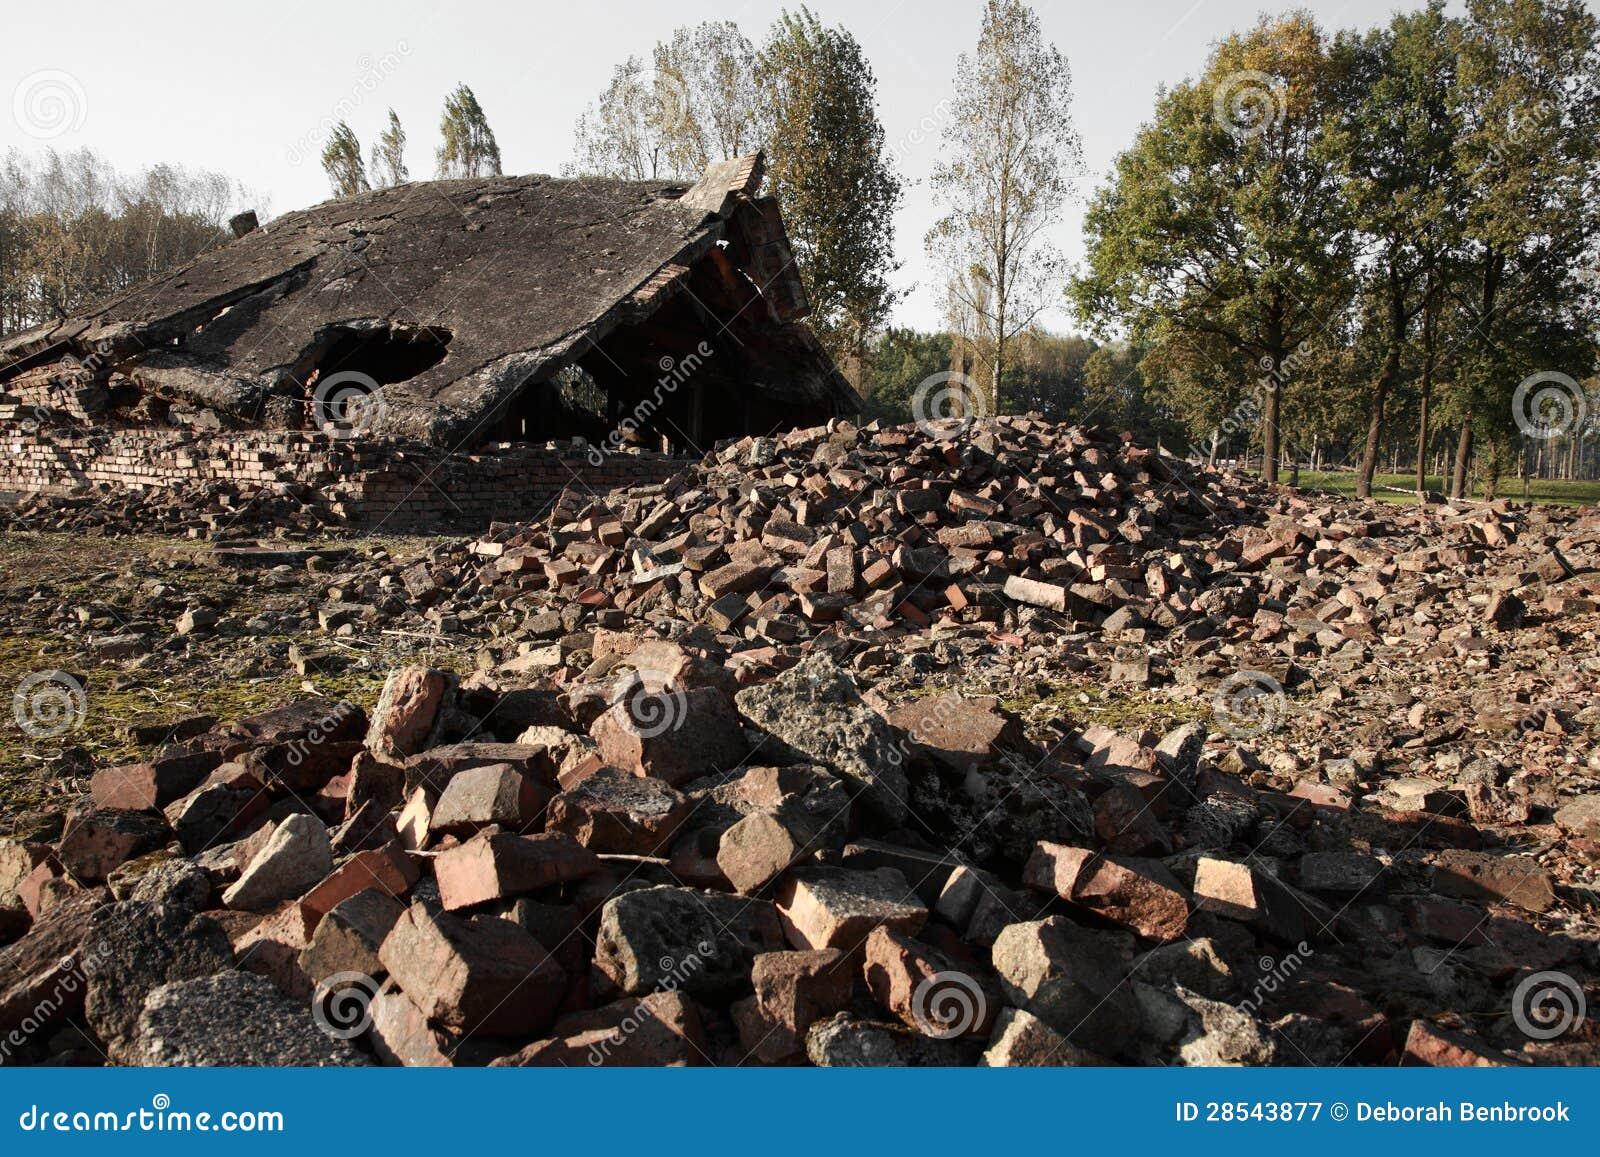 Blocaille des chambres gaz d truites auschwitz for Auschwitz chambre a gaz